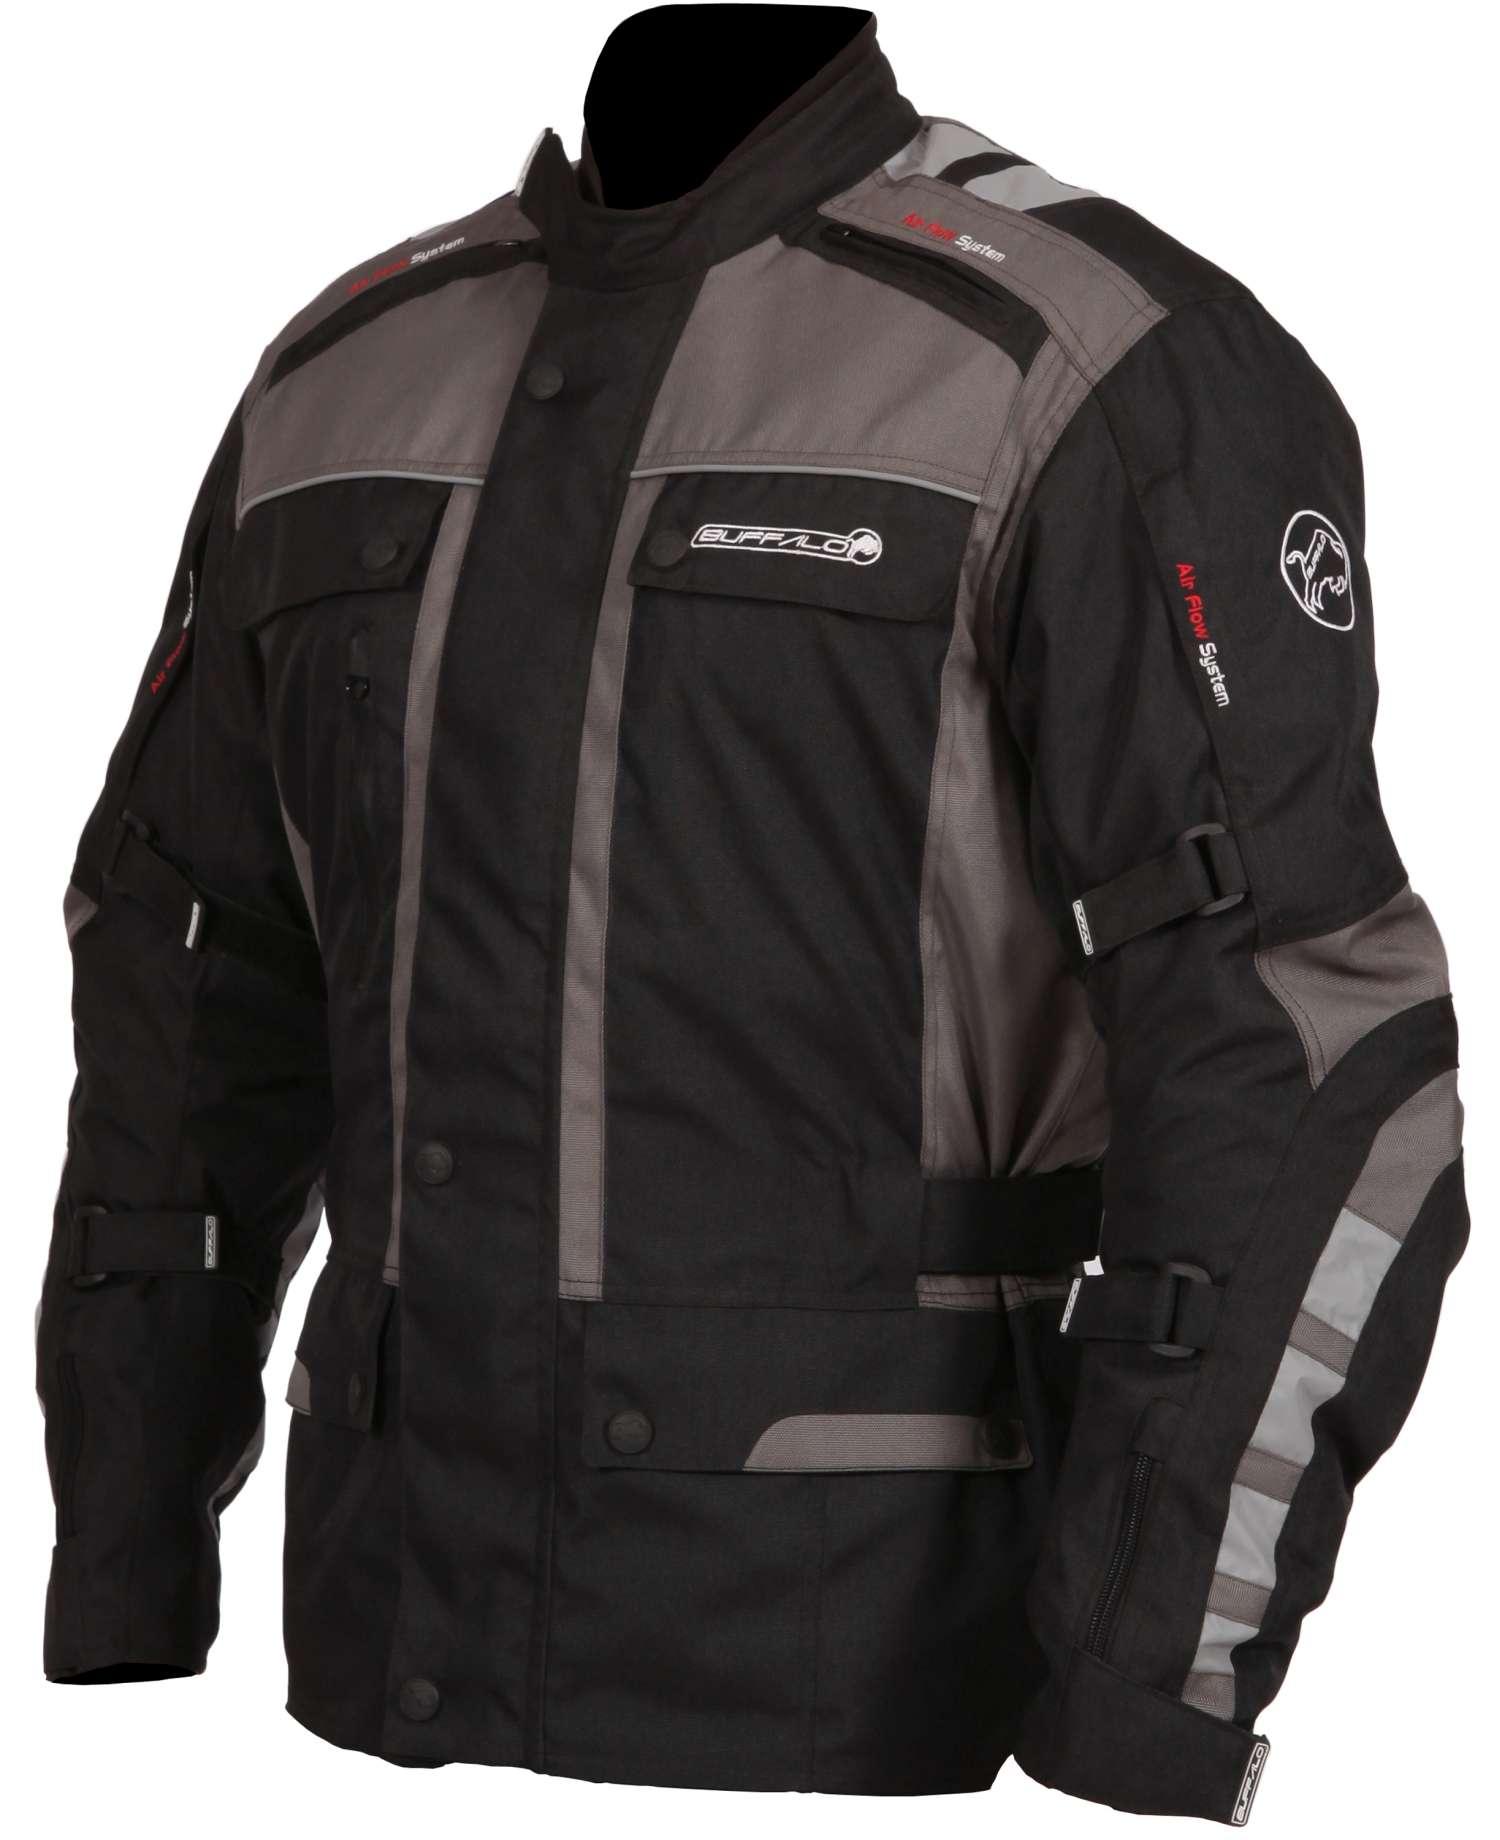 Buffalo-Sonar-jacket